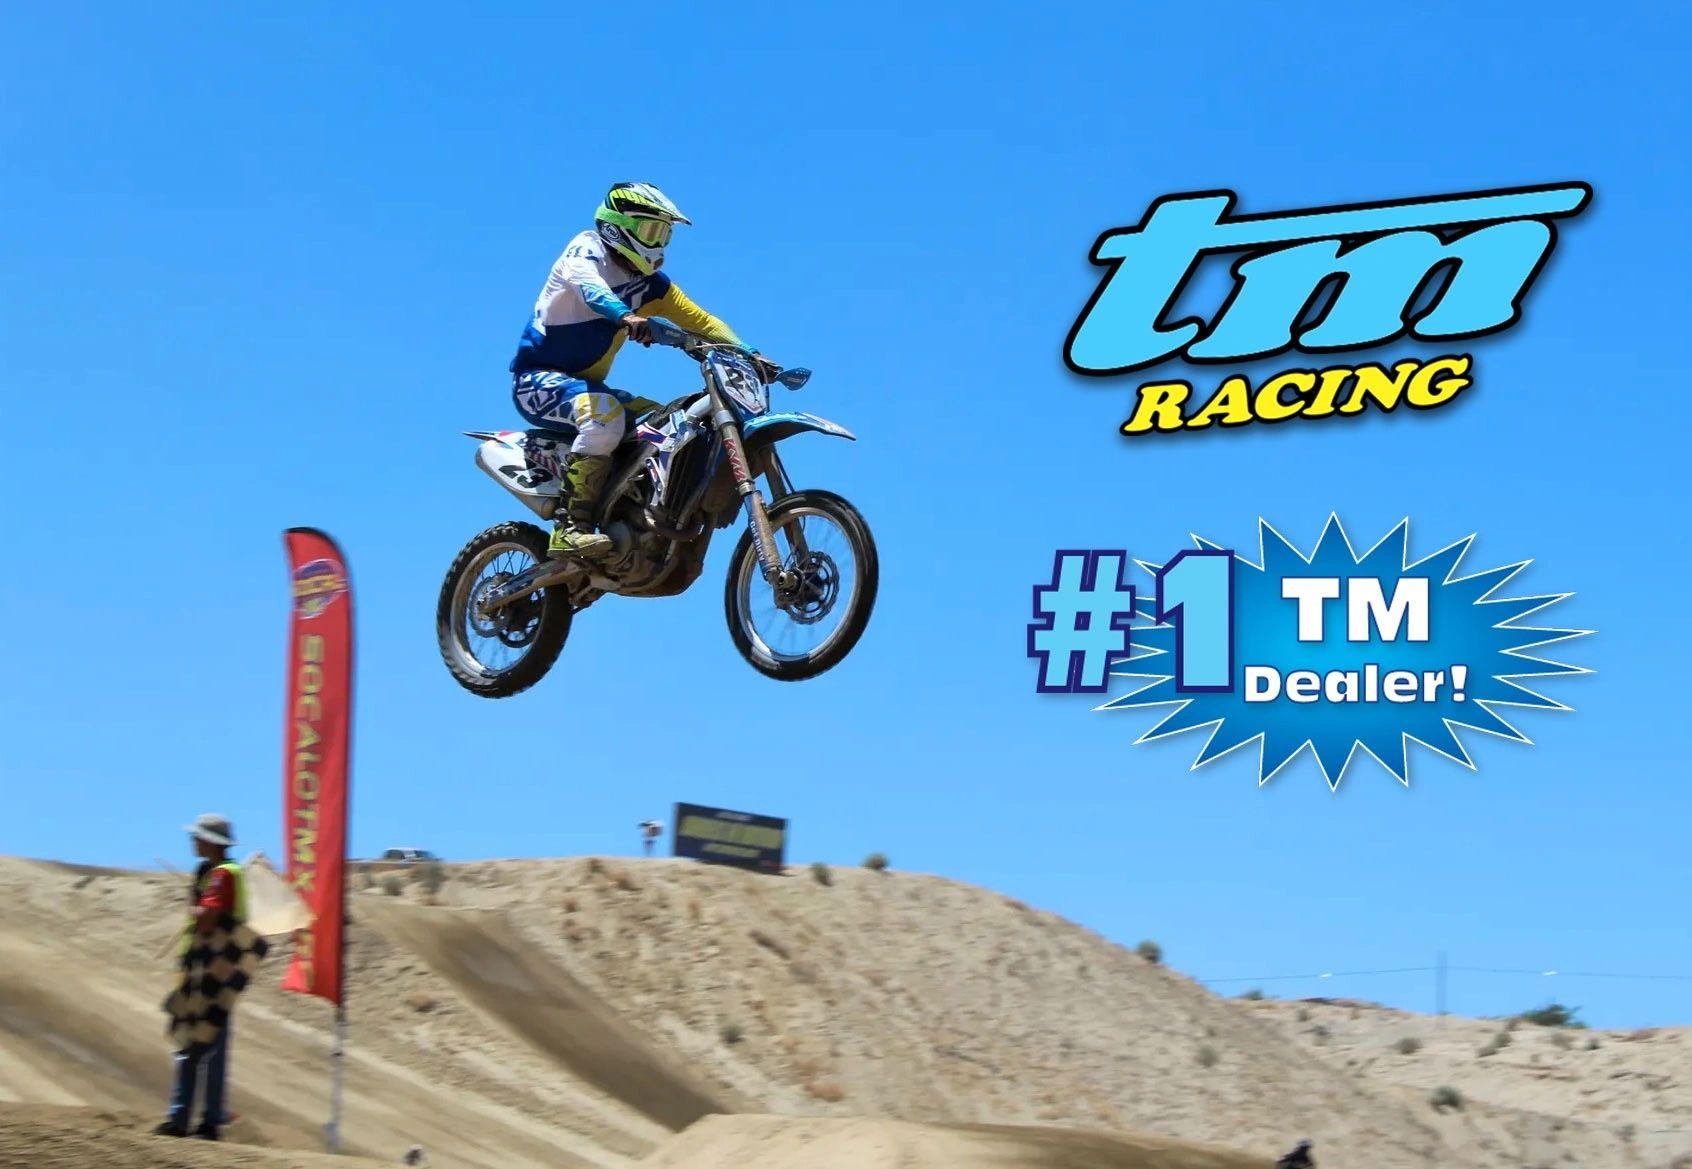 Tm Dirt Bikes >> Get Dirty Dirt Bikes Tm Parts And Accessories